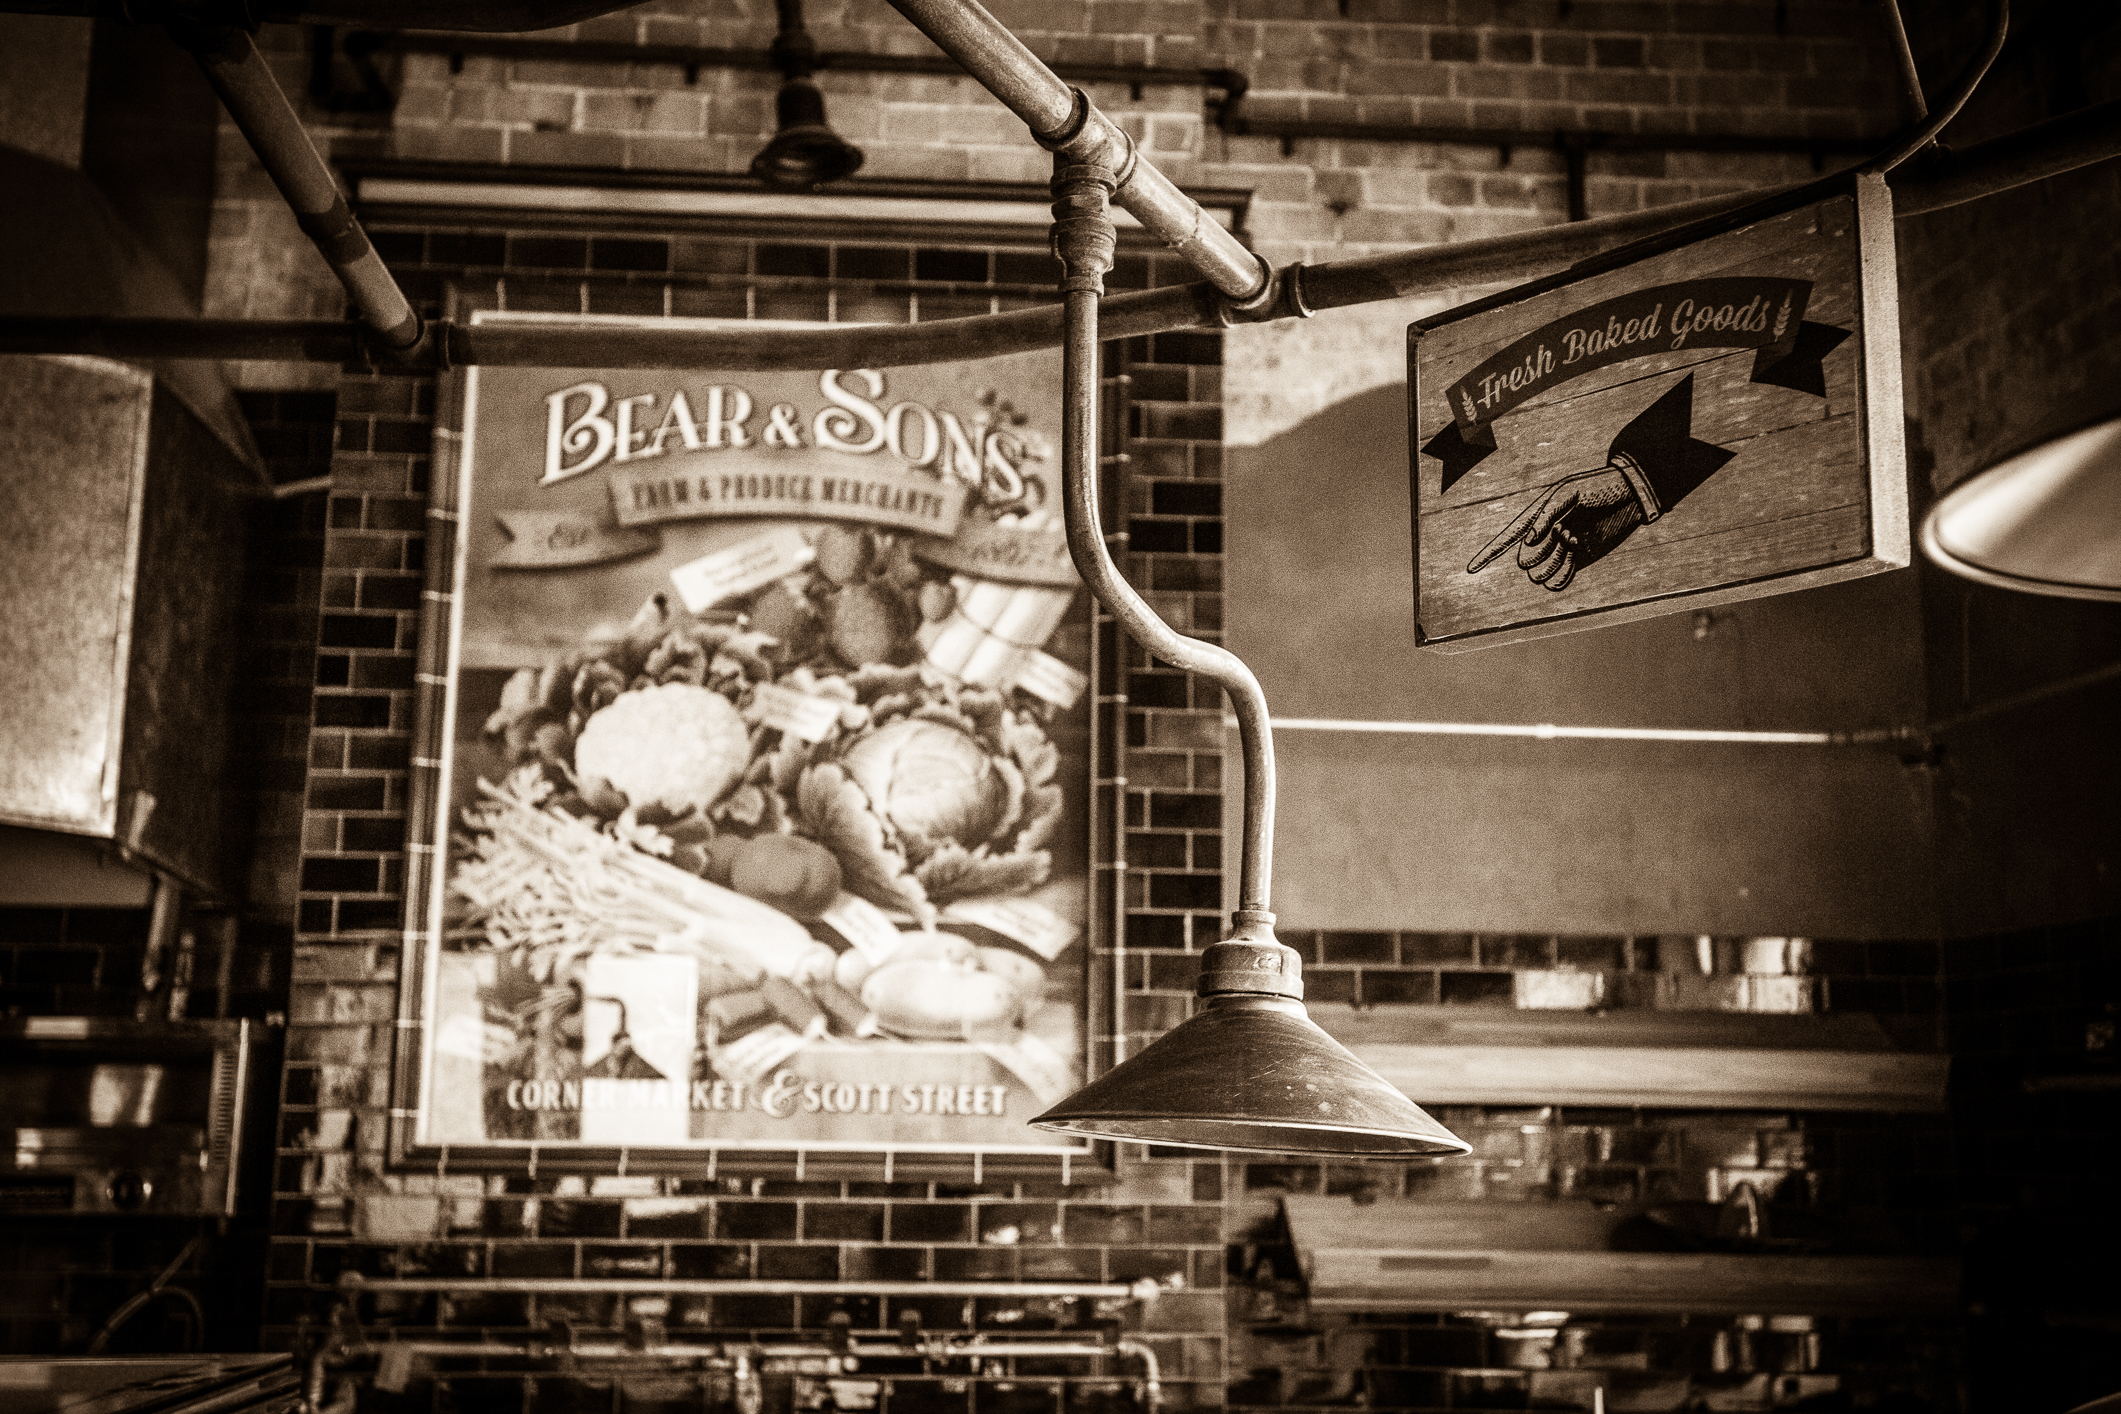 Bear & Sons poster